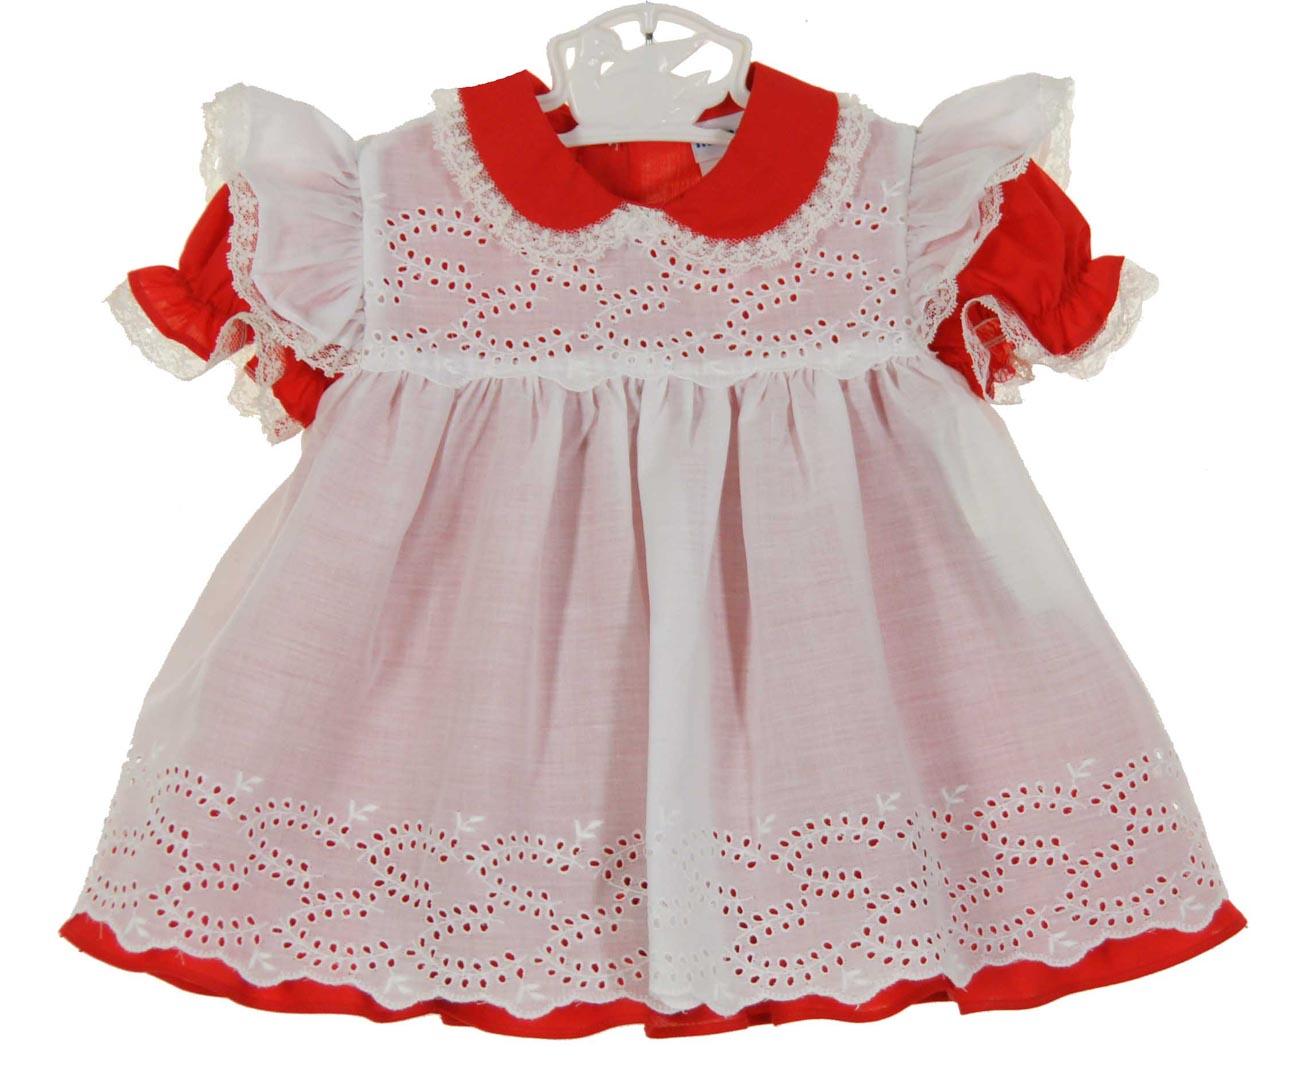 Vintage Dresses for Little Girls.